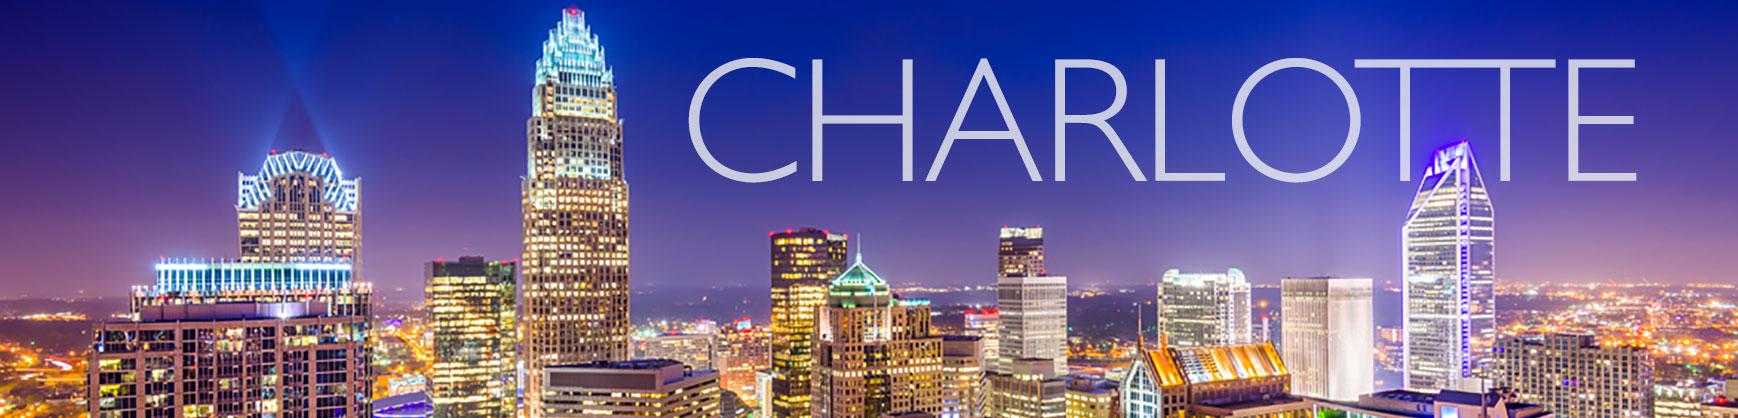 Charlotte HD wallpapers, Desktop wallpaper - most viewed